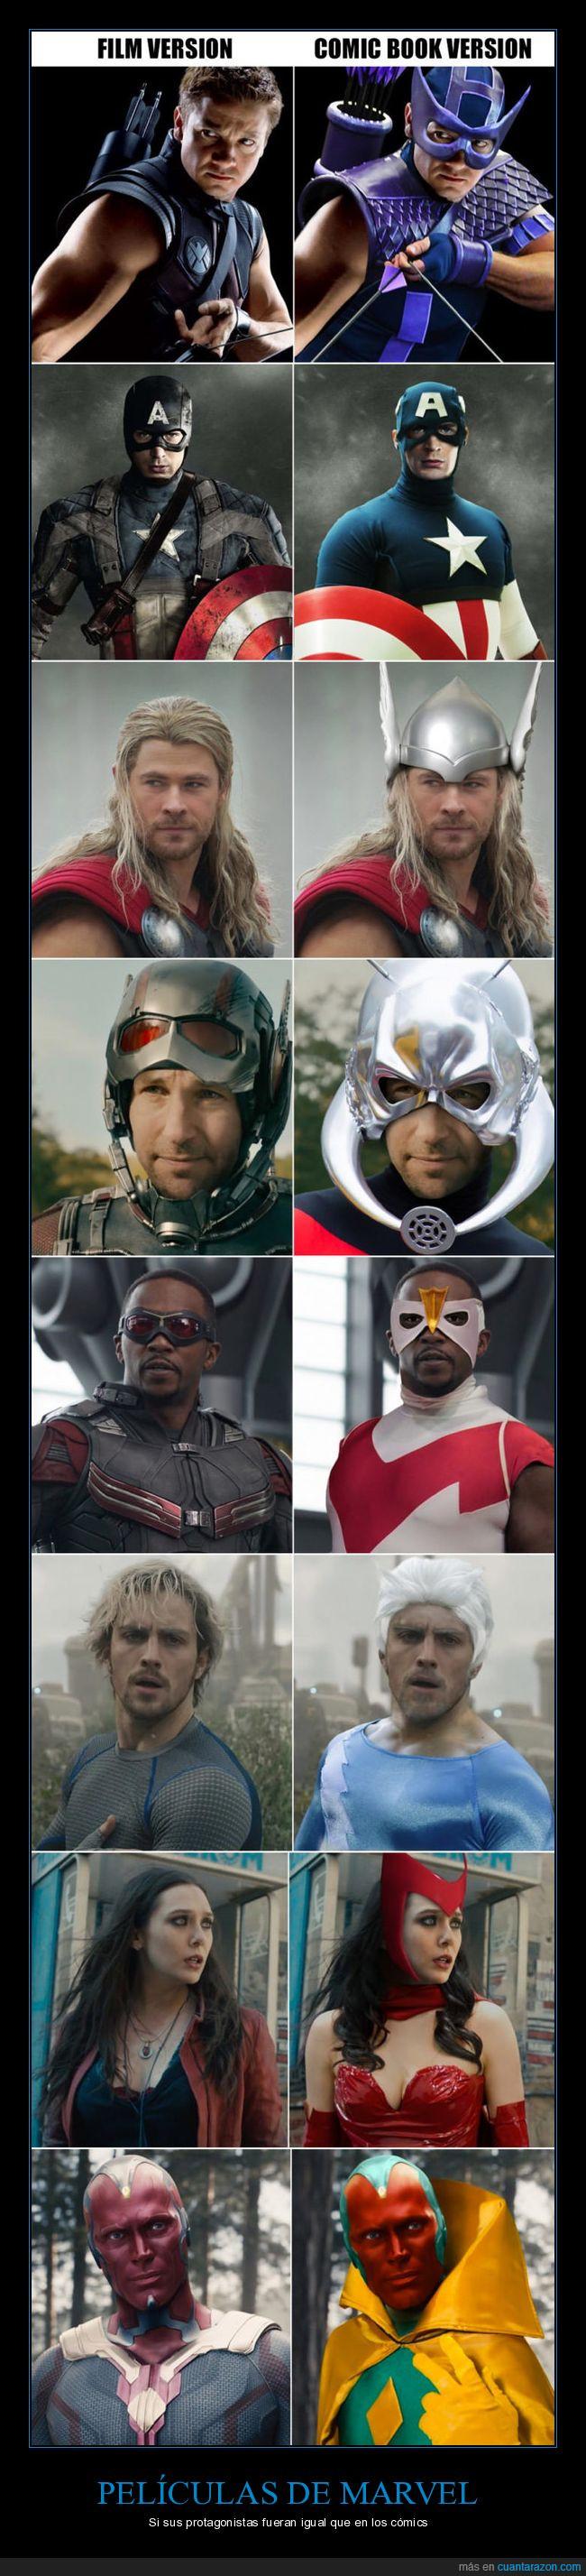 cómics,marvel,películas,personajes,real